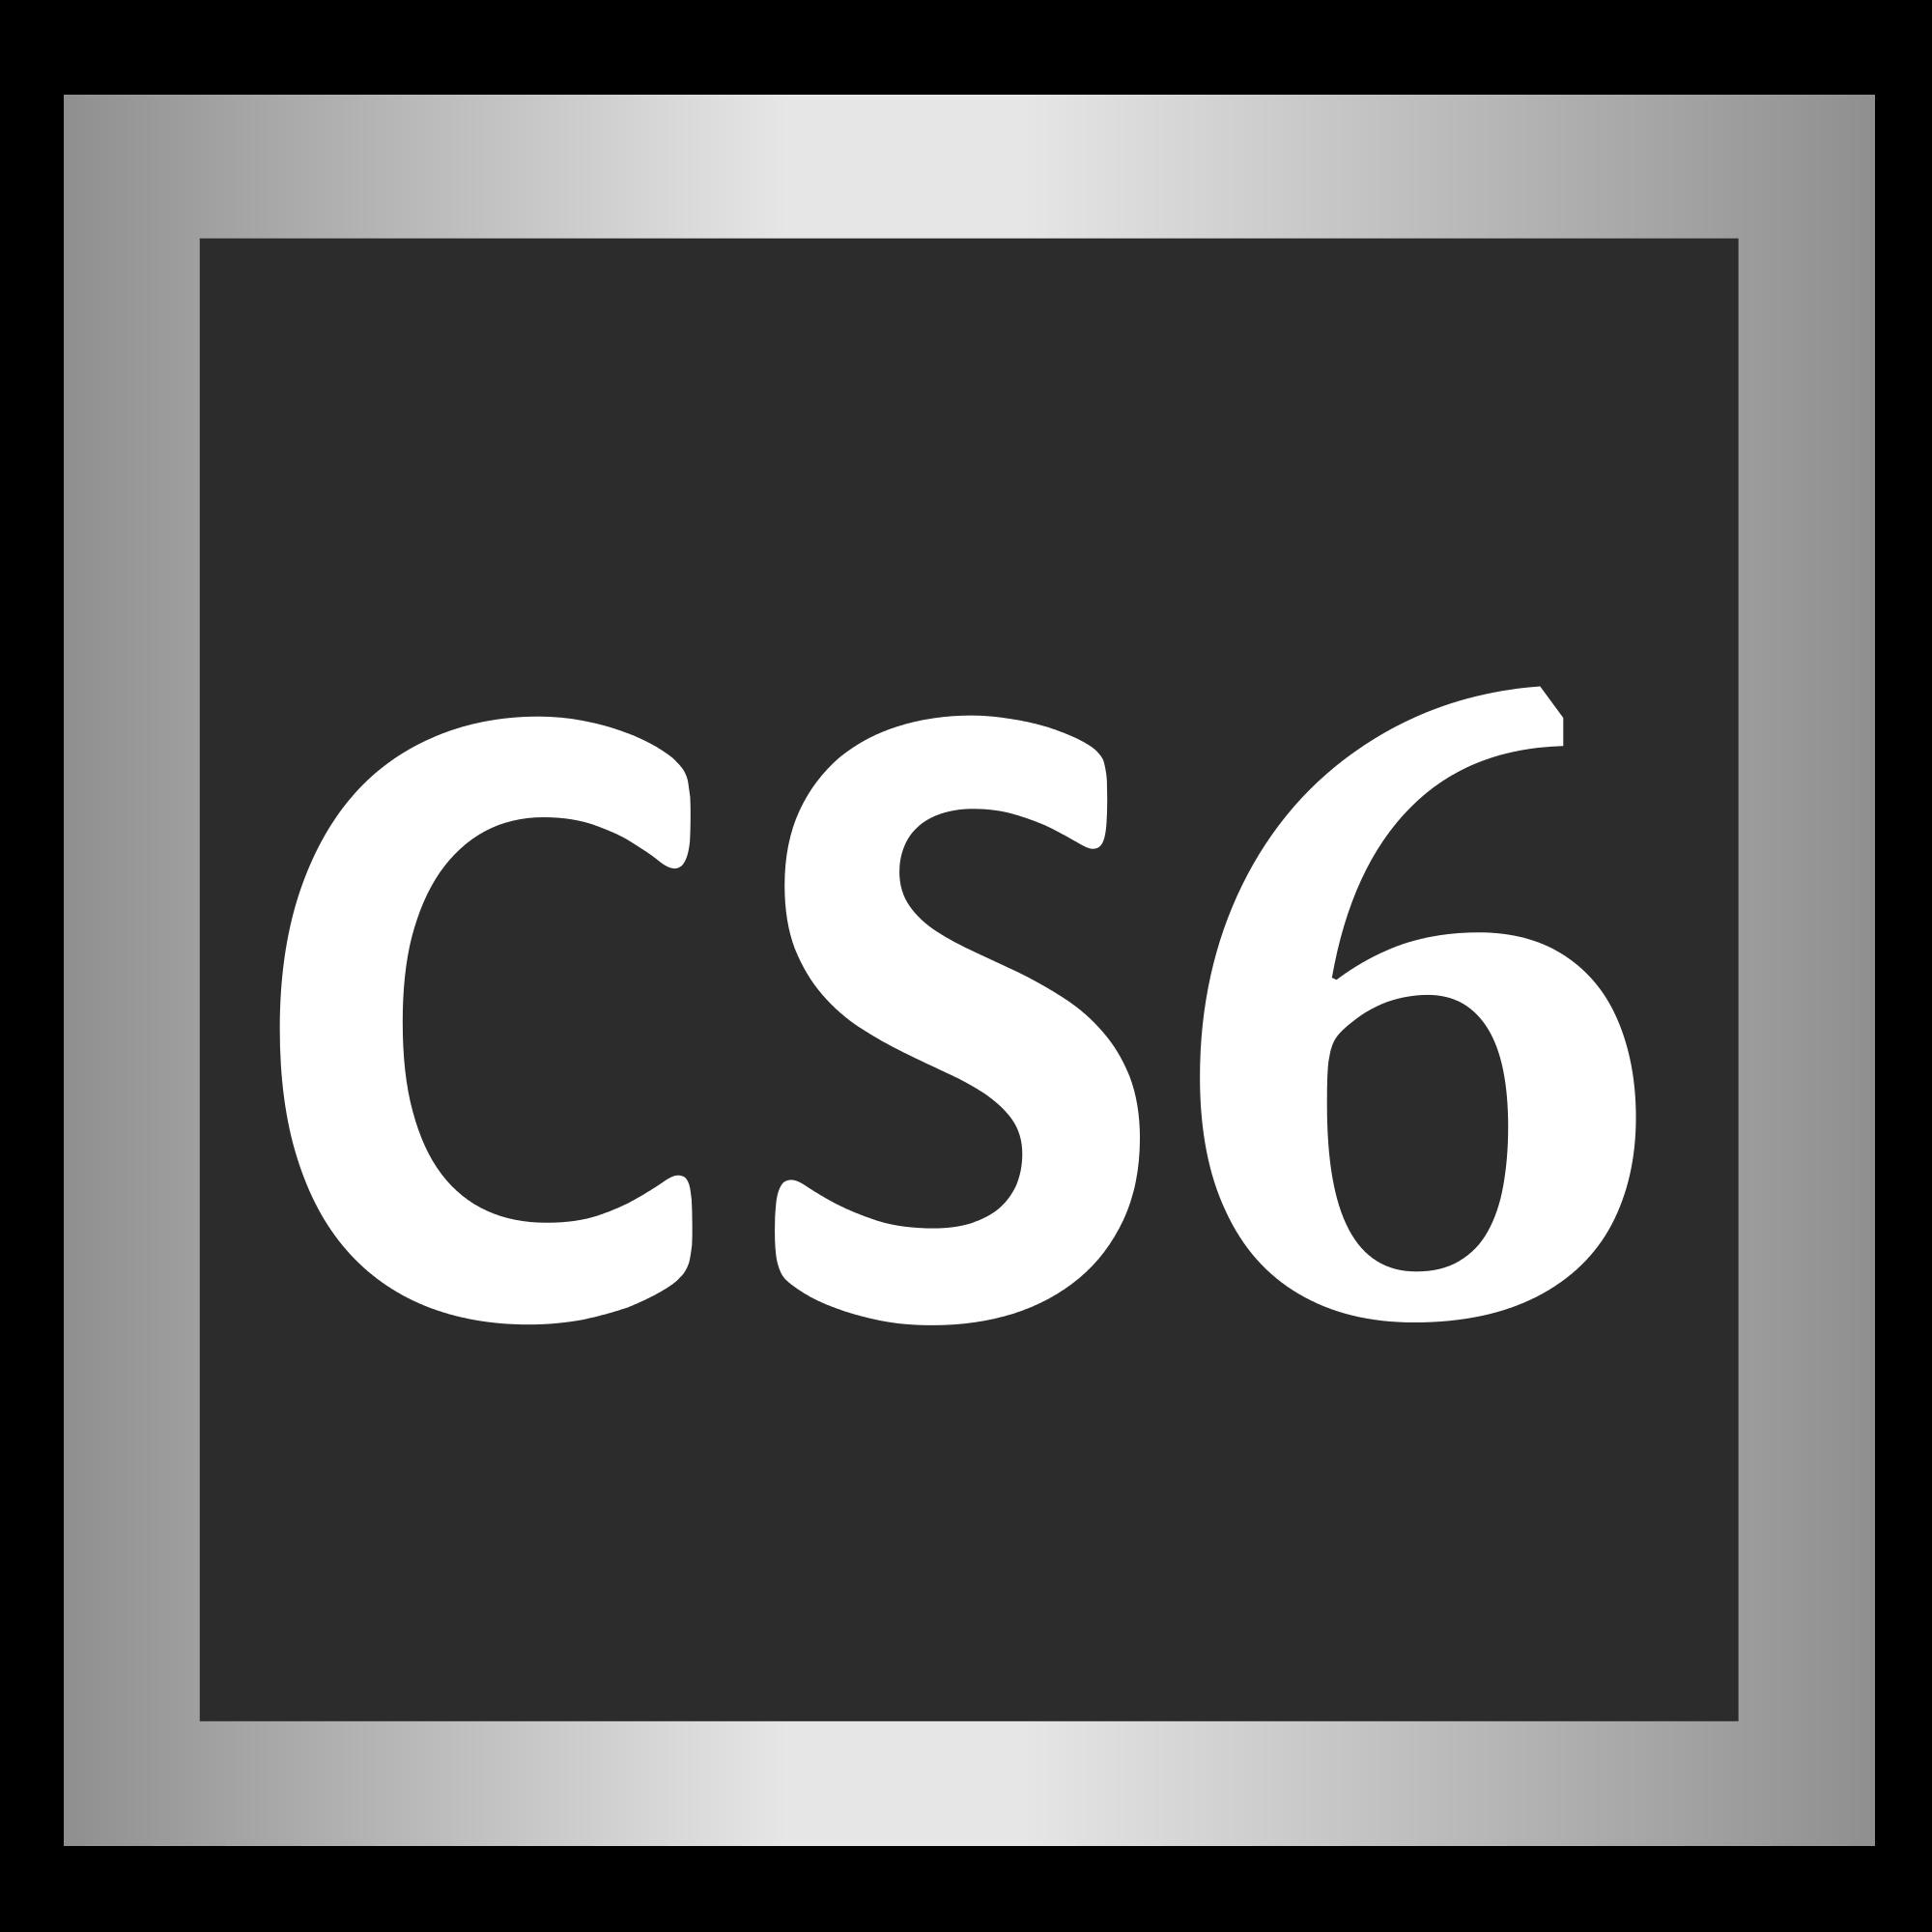 Adobe Black Logo Vector PNG - 30025